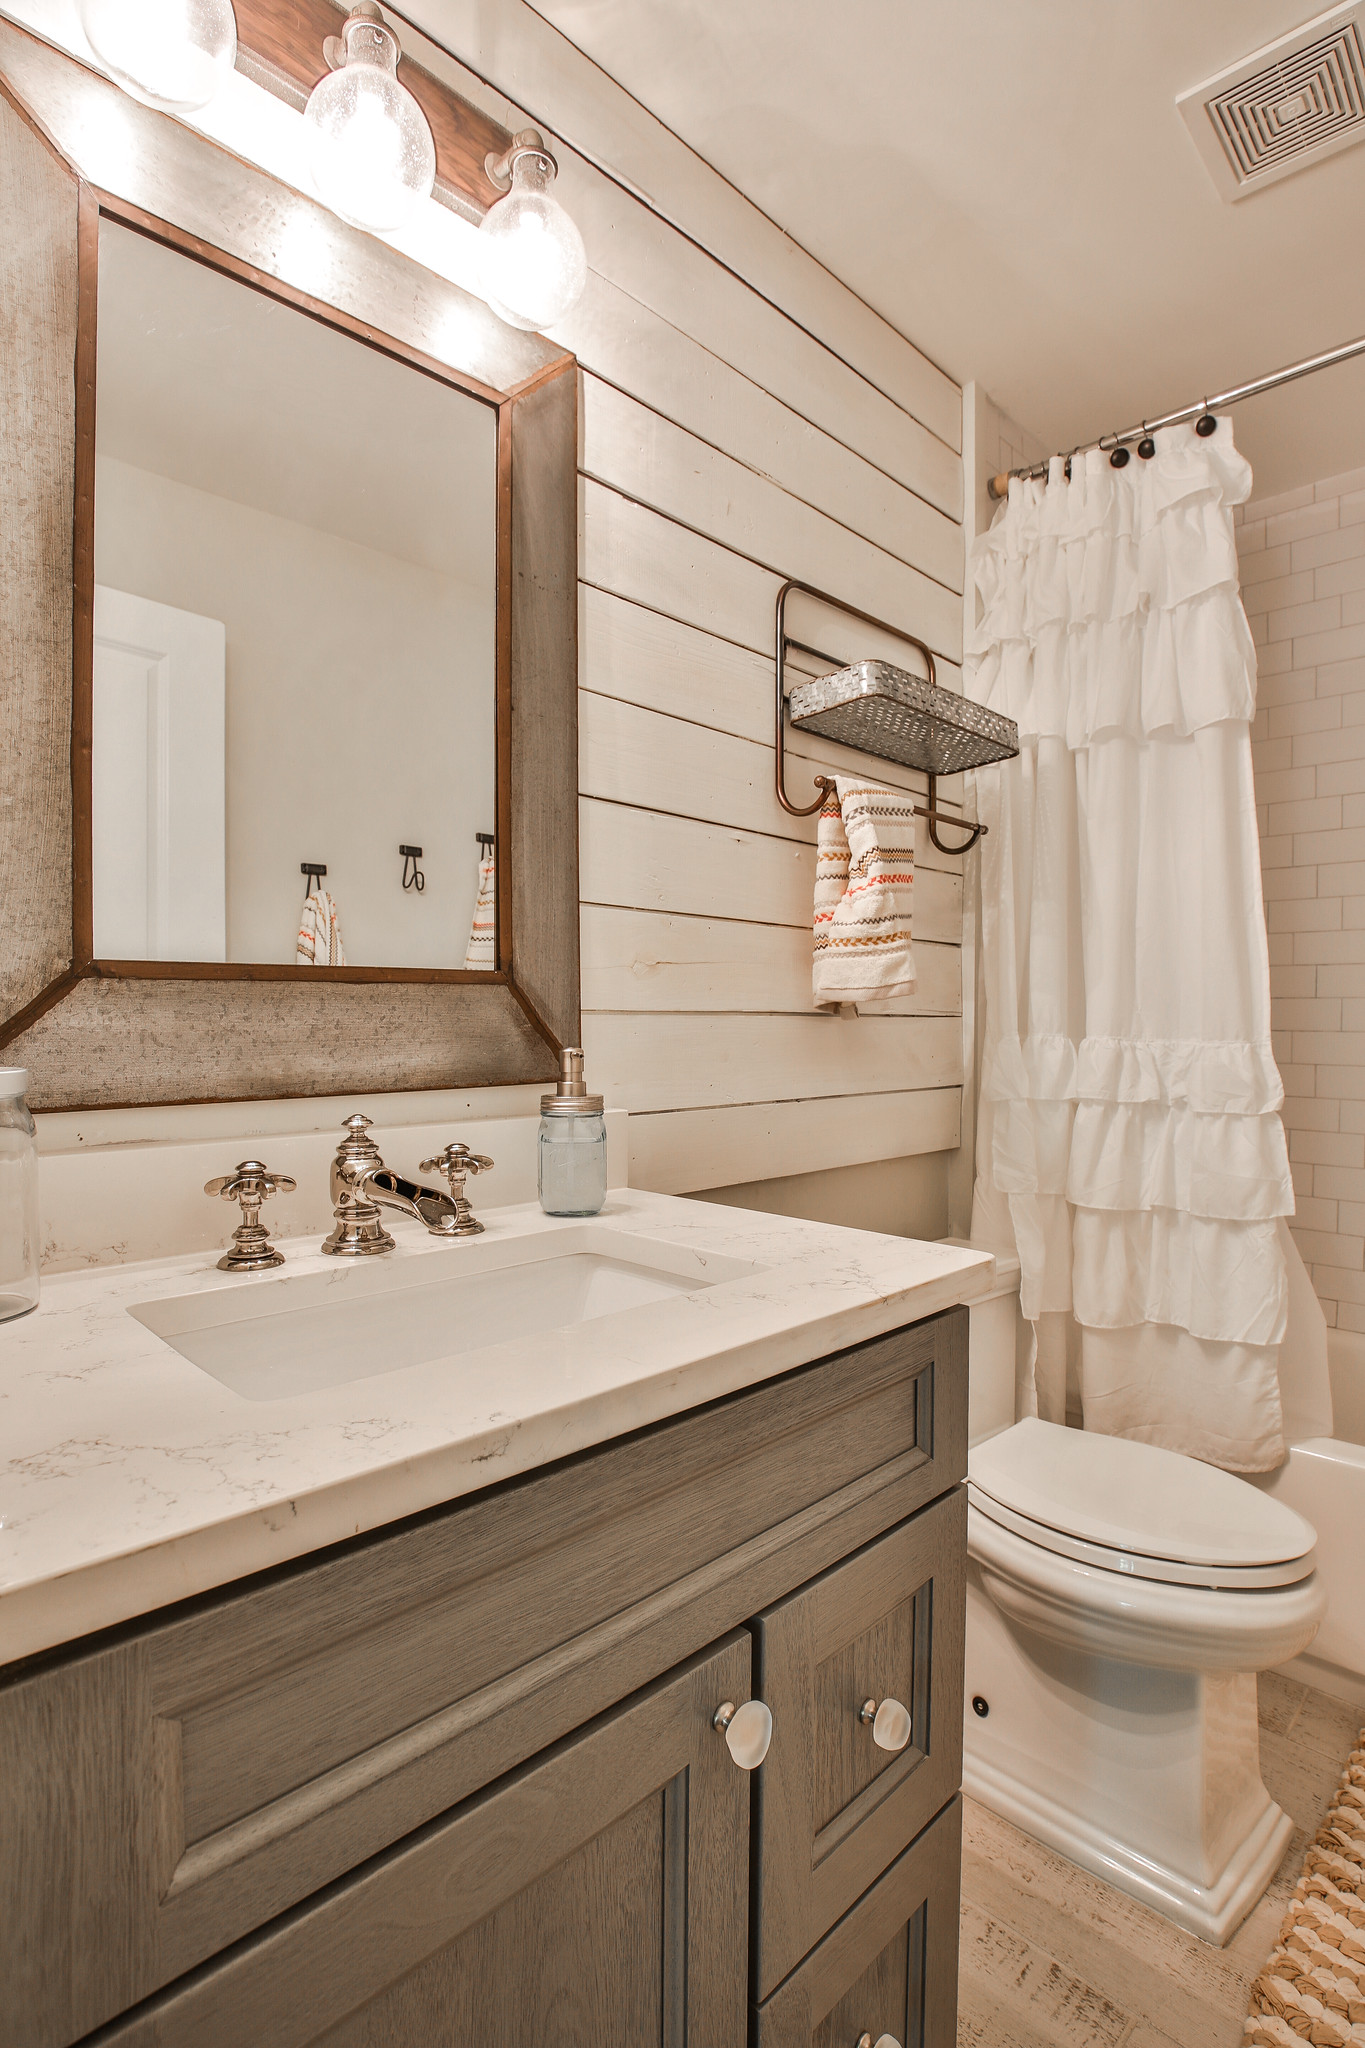 Custom vanity: Forevermark Cabinetry, Drawer knobs: Liberty Hardware, Counter: Hanstone Quartz . Plumbing fixtures, faucets, sink, toilet: Kohler, Lighting: Savoy House.